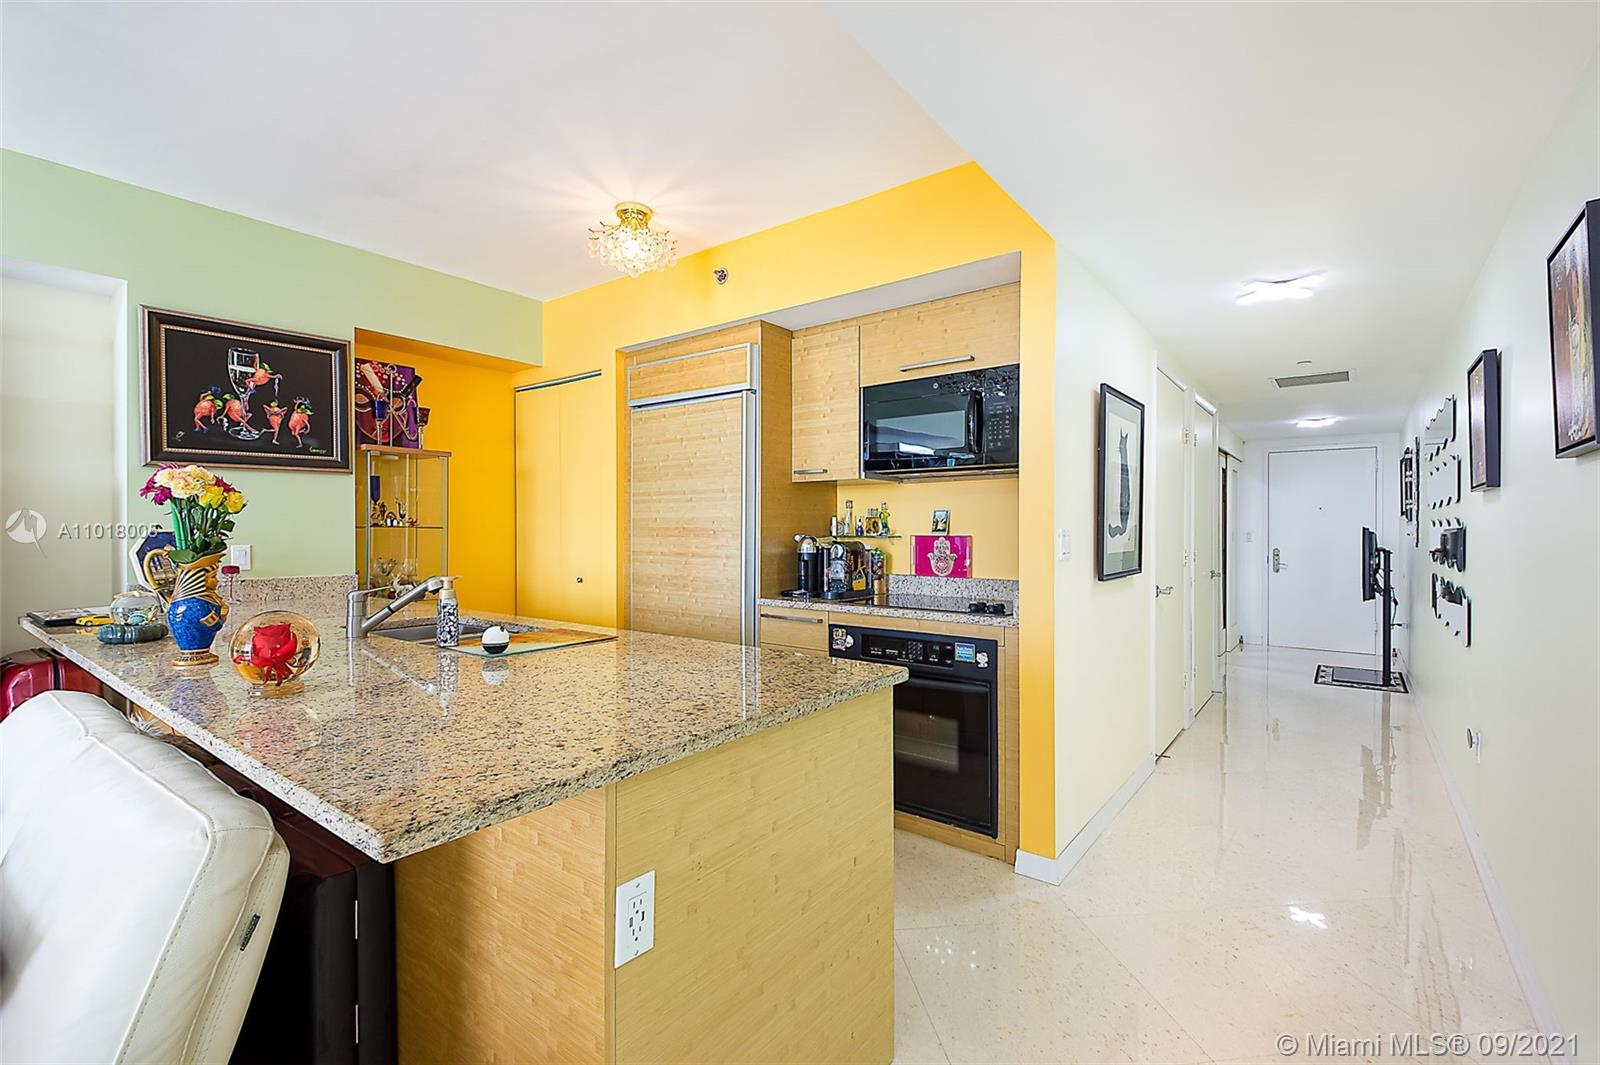 4805 1 / 1 811 sq. ft. $ 2021-04-23 0 Photo